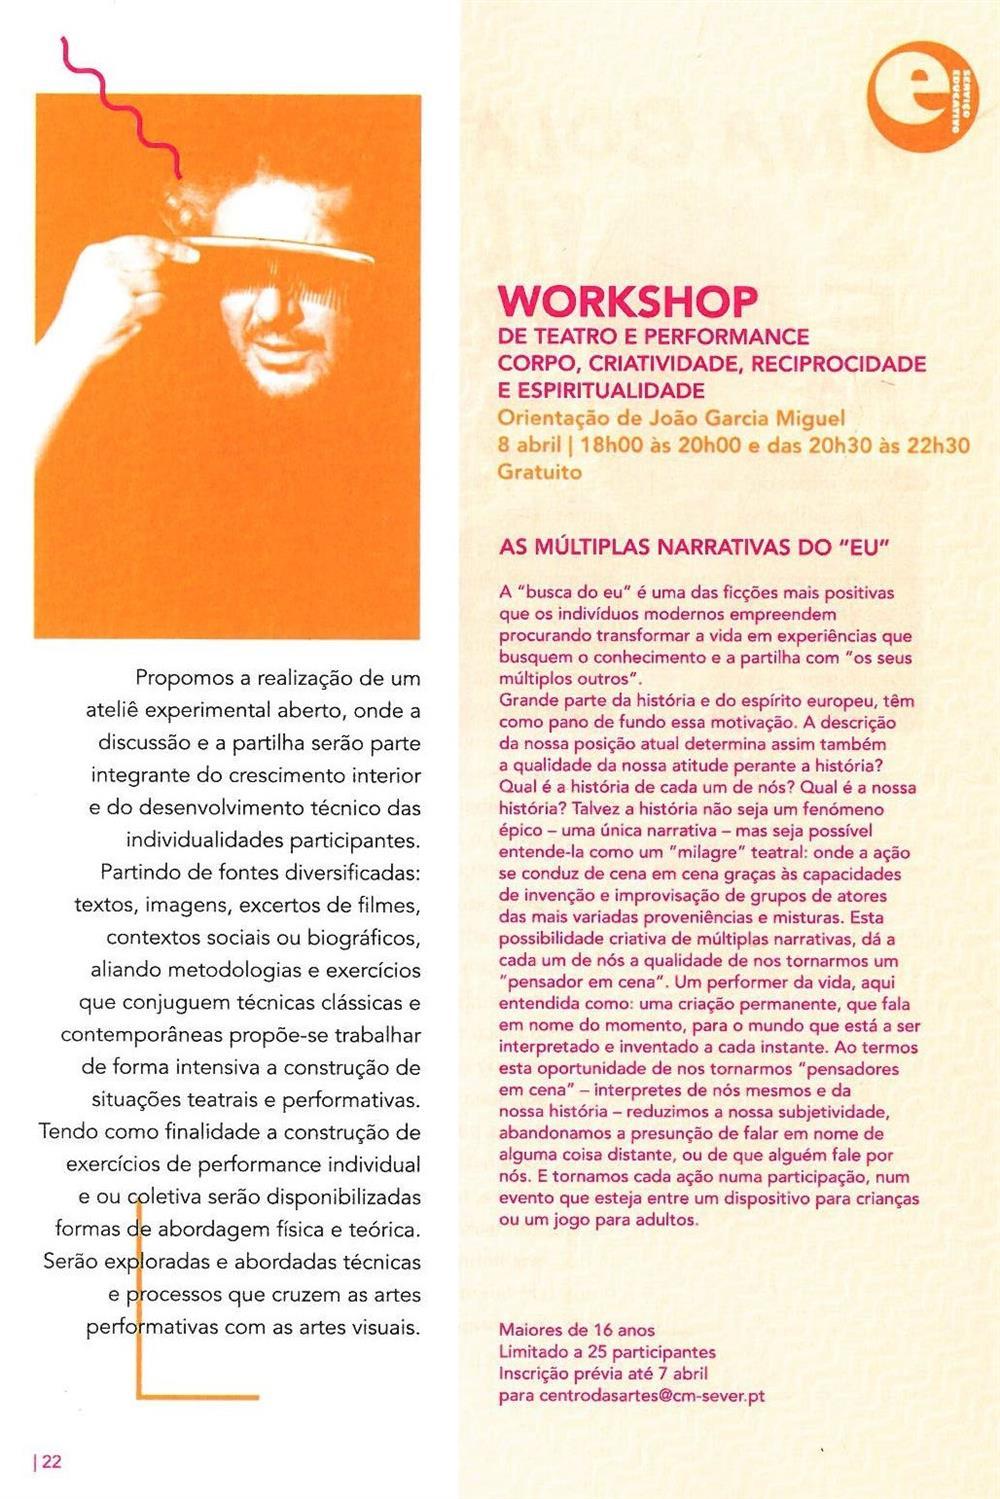 ACMSV-abr.,maio,jun.,jul.'16-p.22-Workshop de teatro e performance : corpo, criatividade, reciprocidade e espiritualidade : as múltiplas narrativas do eu.jpg